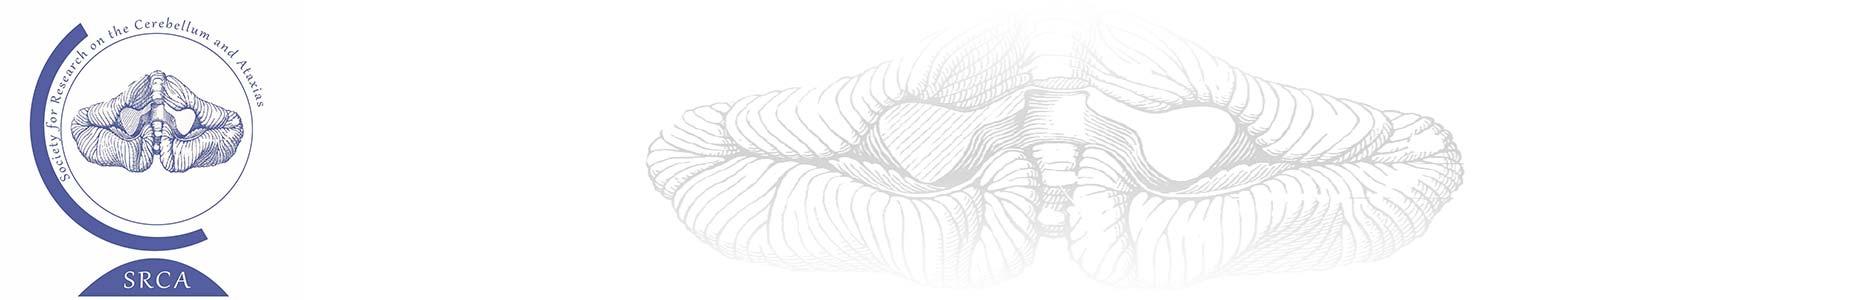 logo SRCA